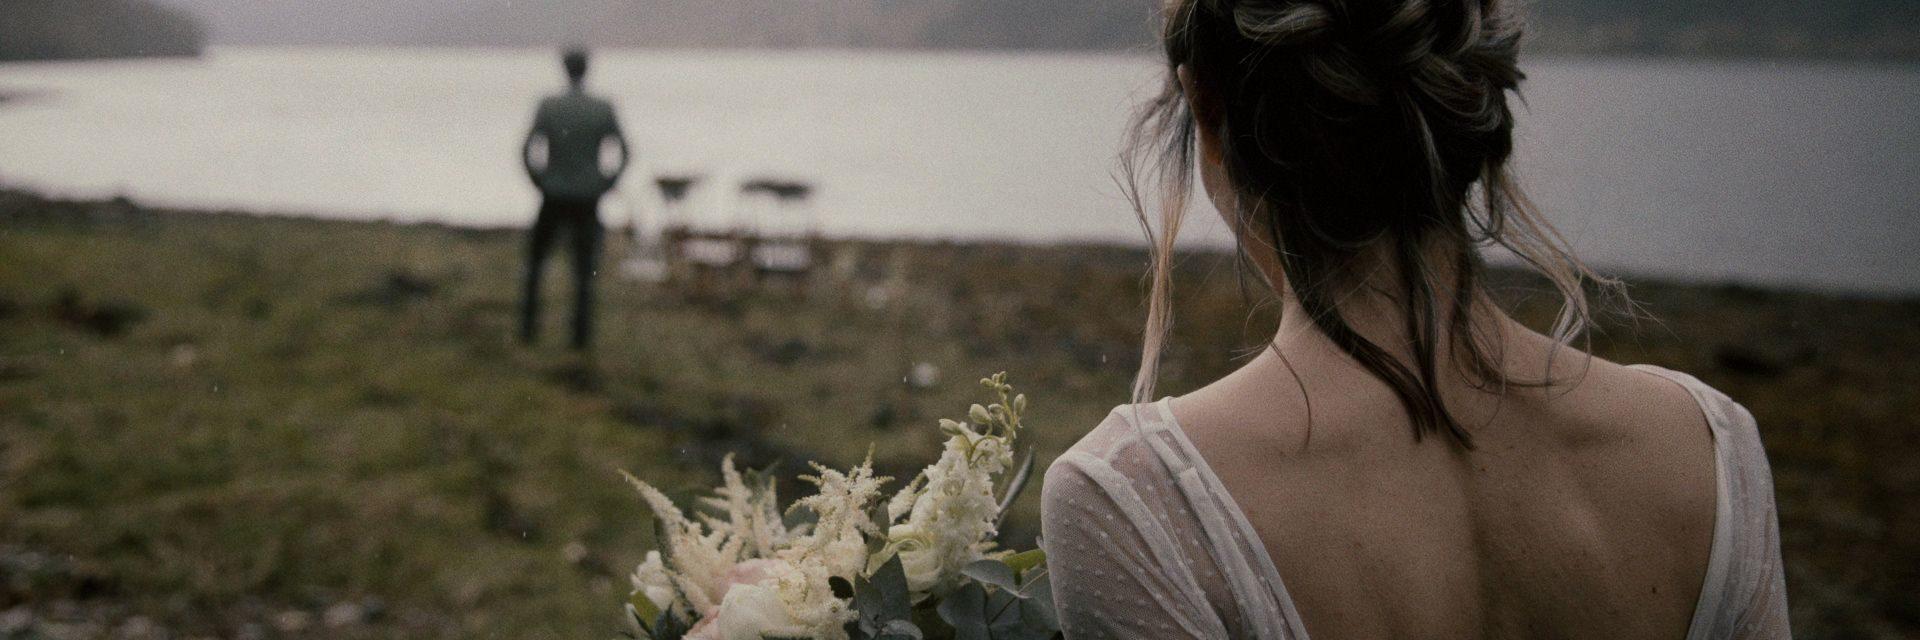 Algarve-wedding-videographer-cinemate-films-02